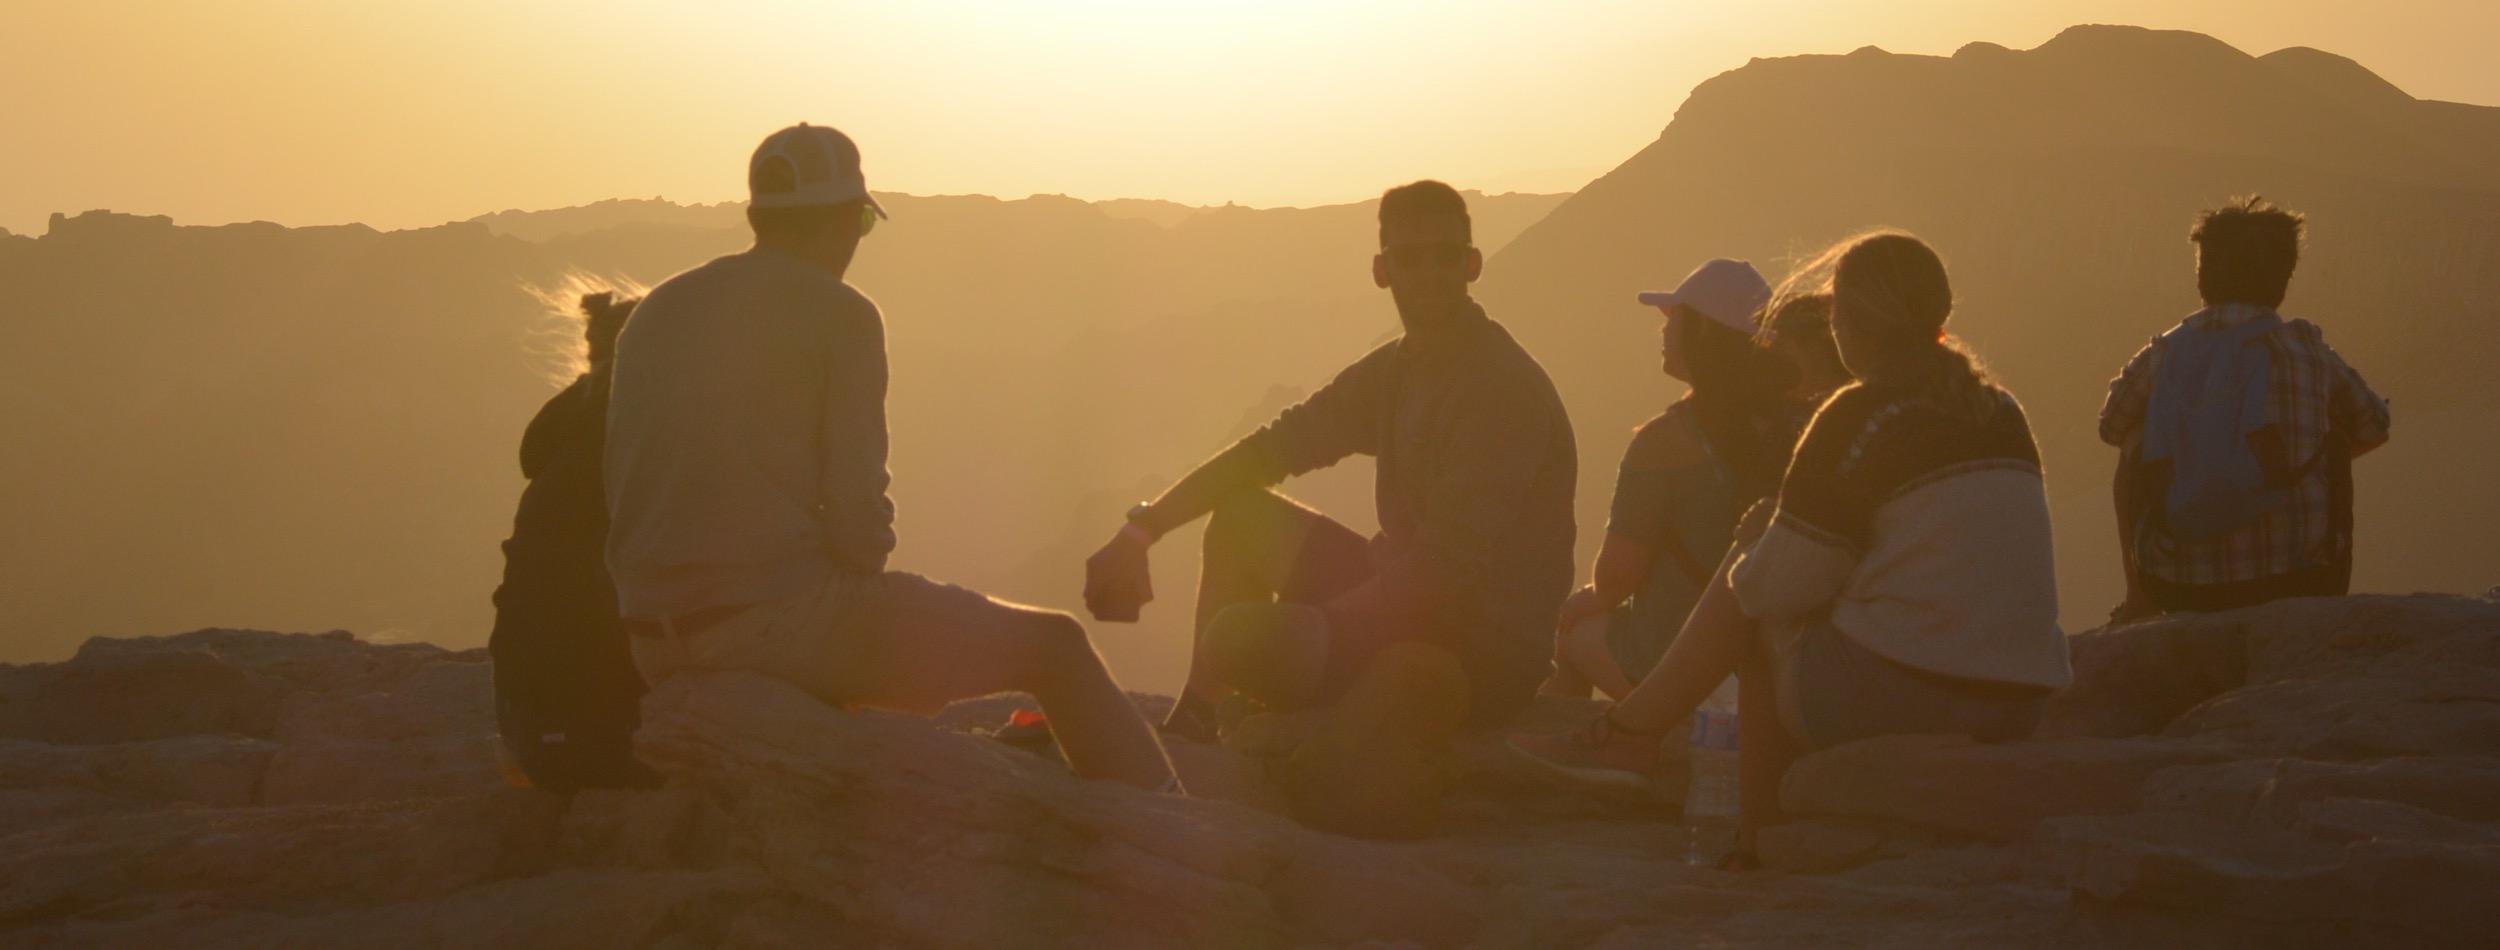 En gruppe mennesker ved en solnedgang